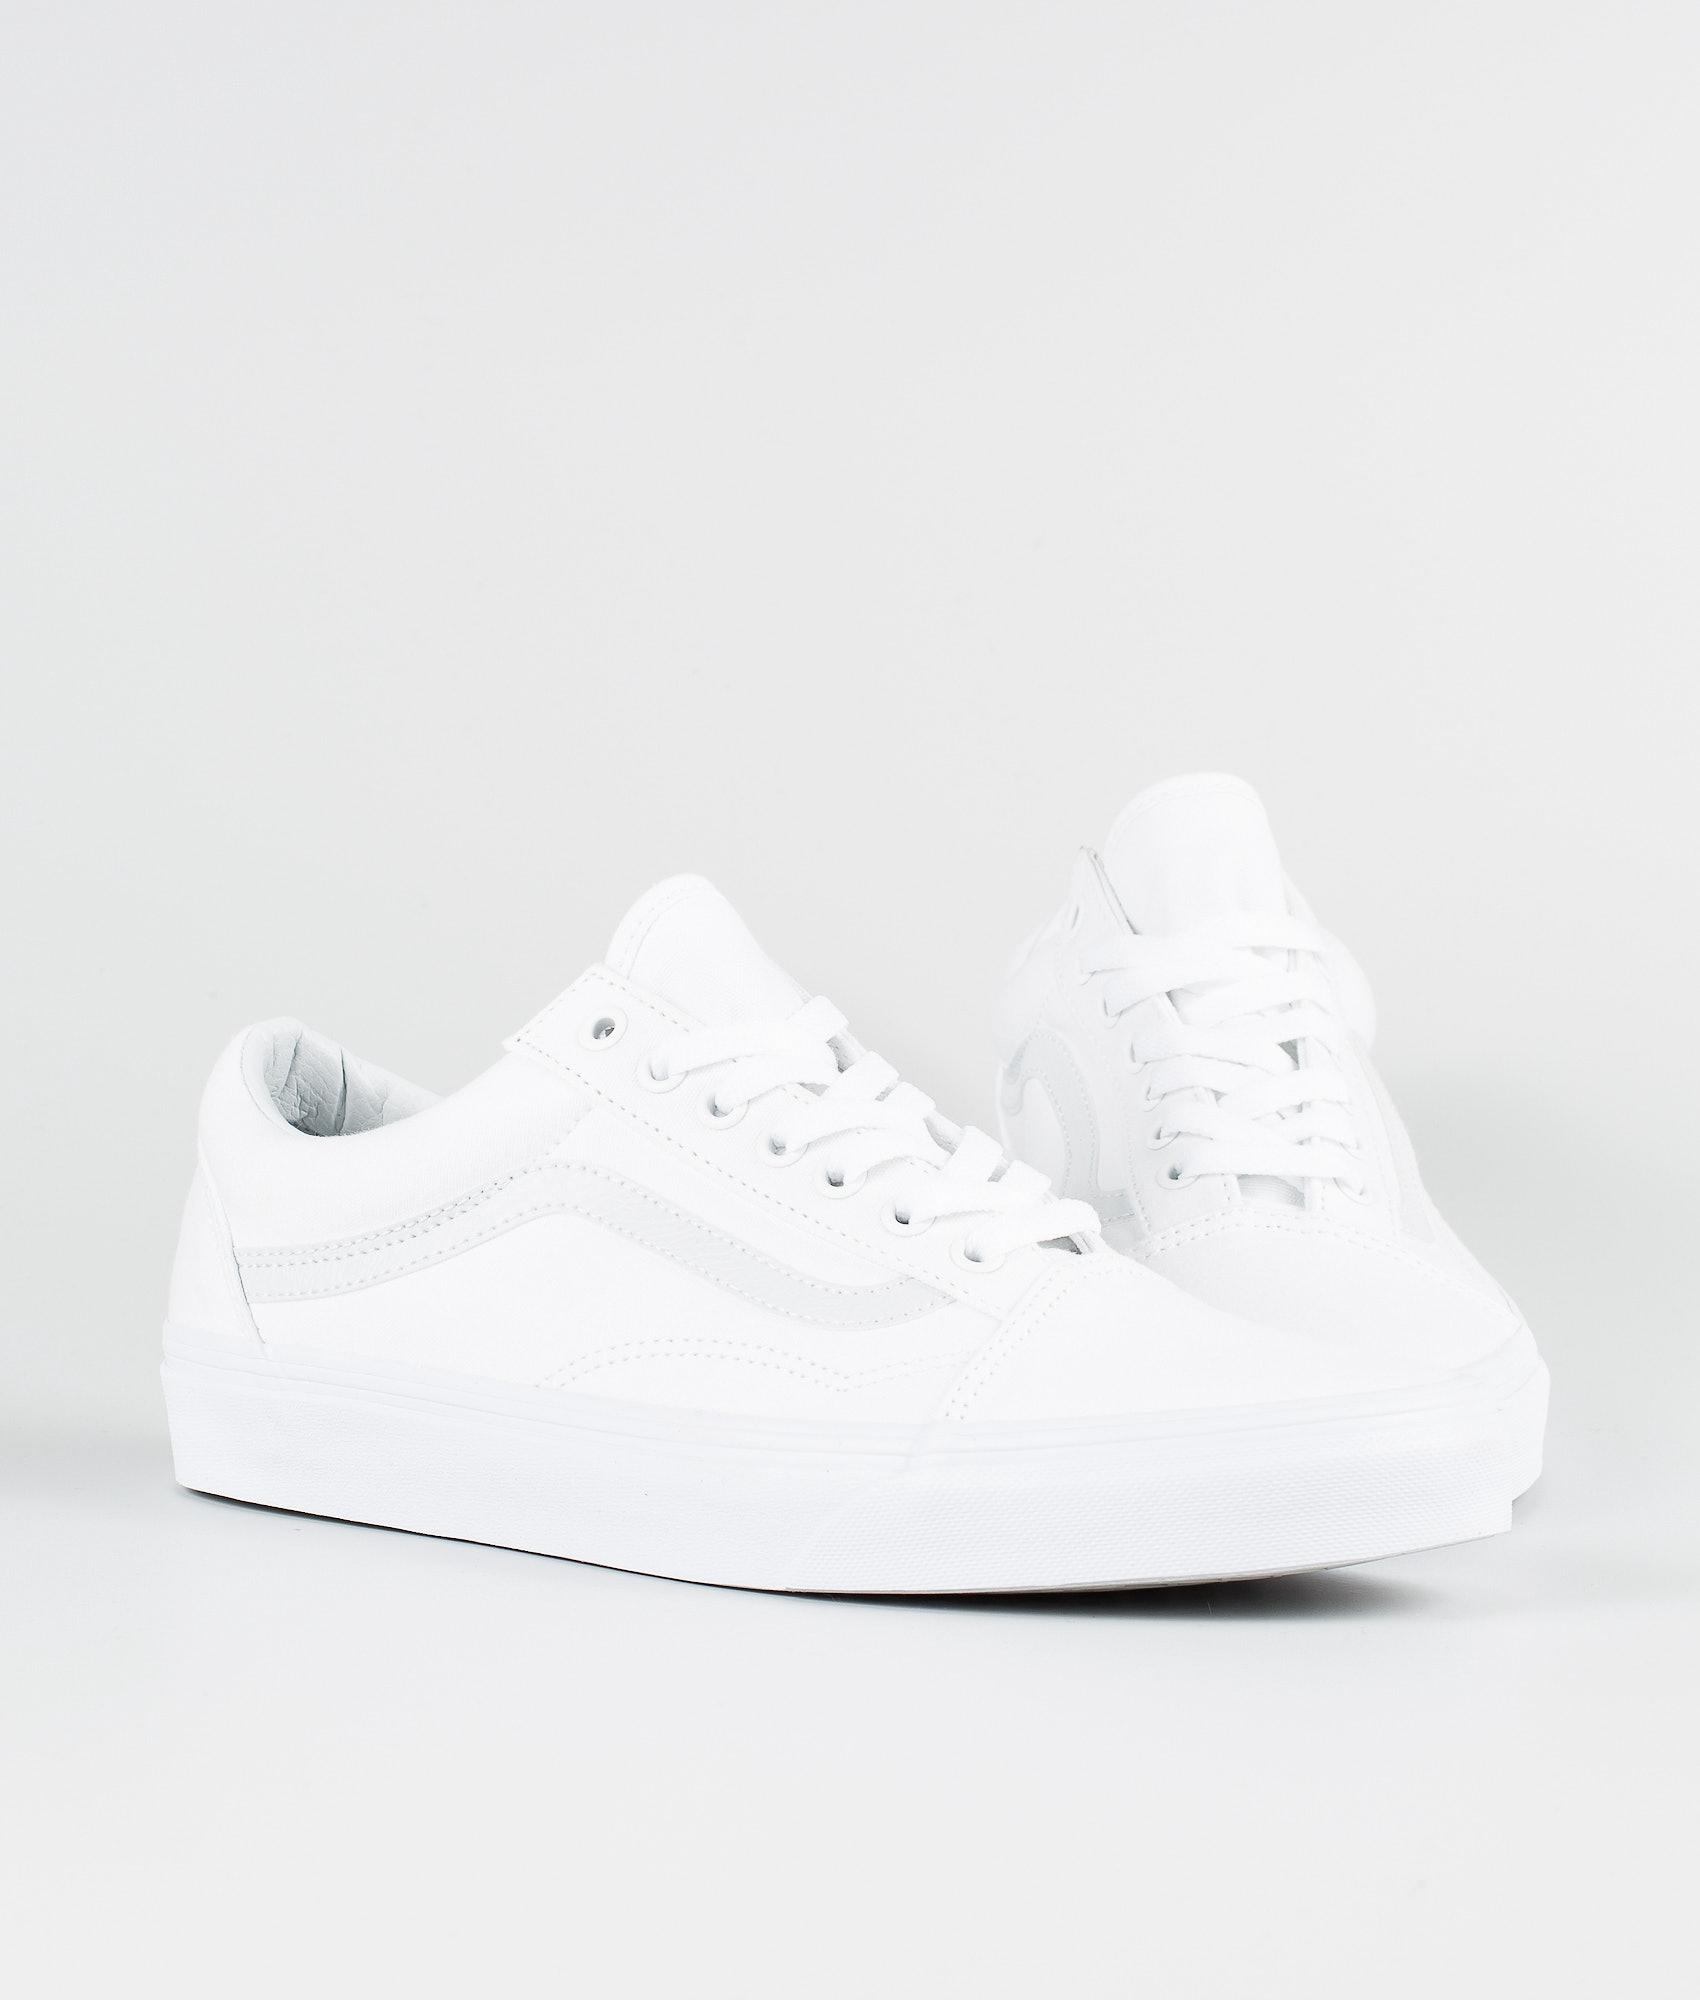 149764d9ef Vans Old Skool Shoes True White - Ridestore.com